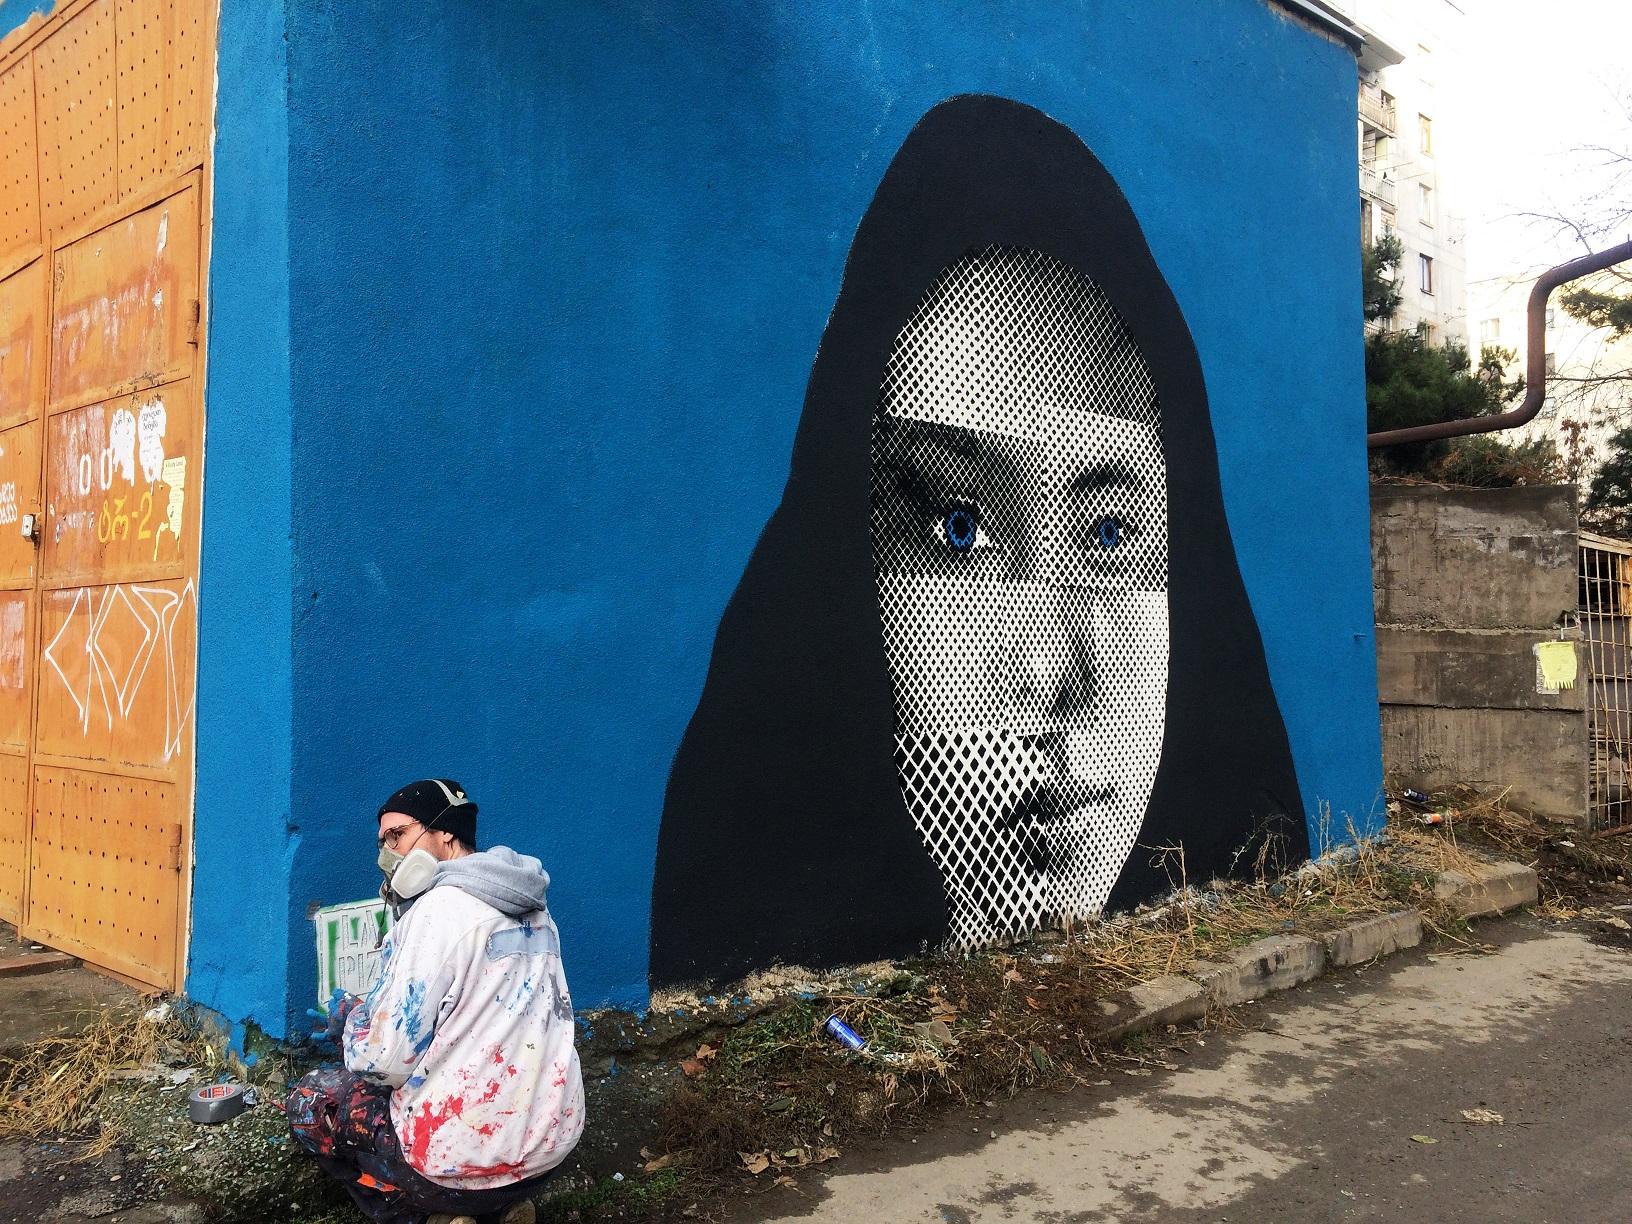 7 #art featured, арт, Бразилия, германия, граффити, Грузия, Дино Бенто, искусство, Лапиз, мурал, Саша Корбан, стрит-арт, тбилиси, украина